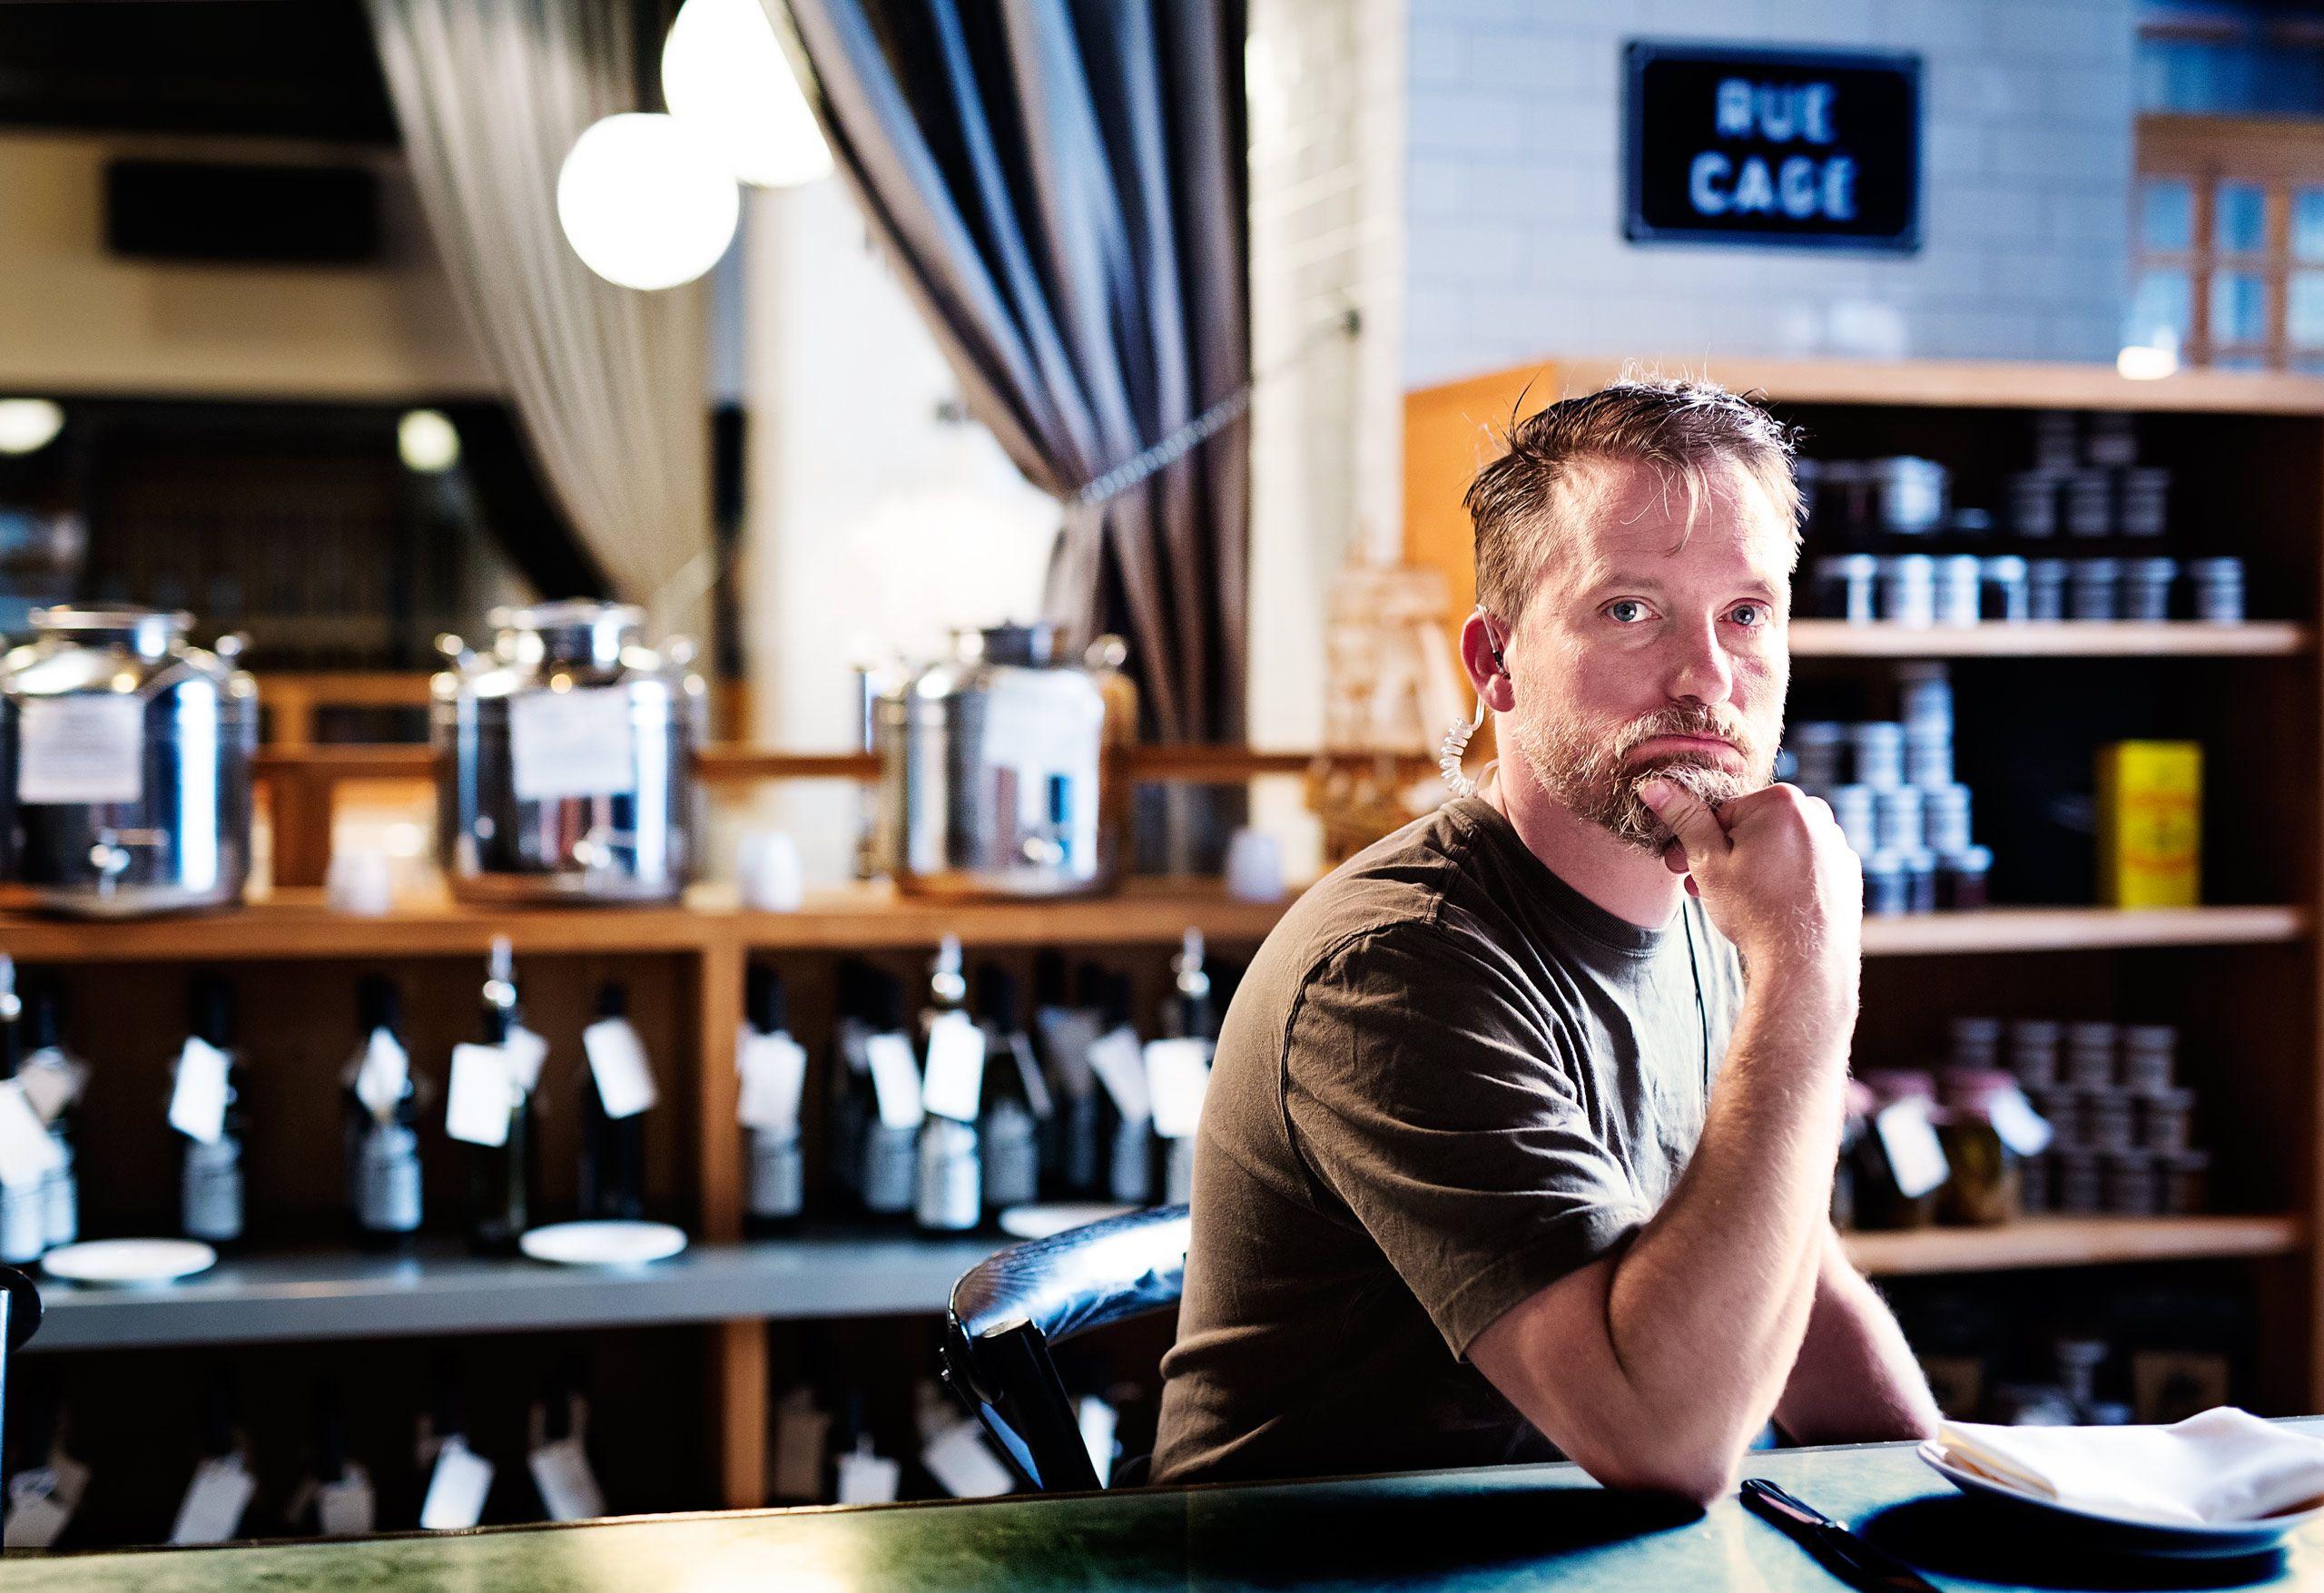 Portrait of a man at olive oil bar.jpg